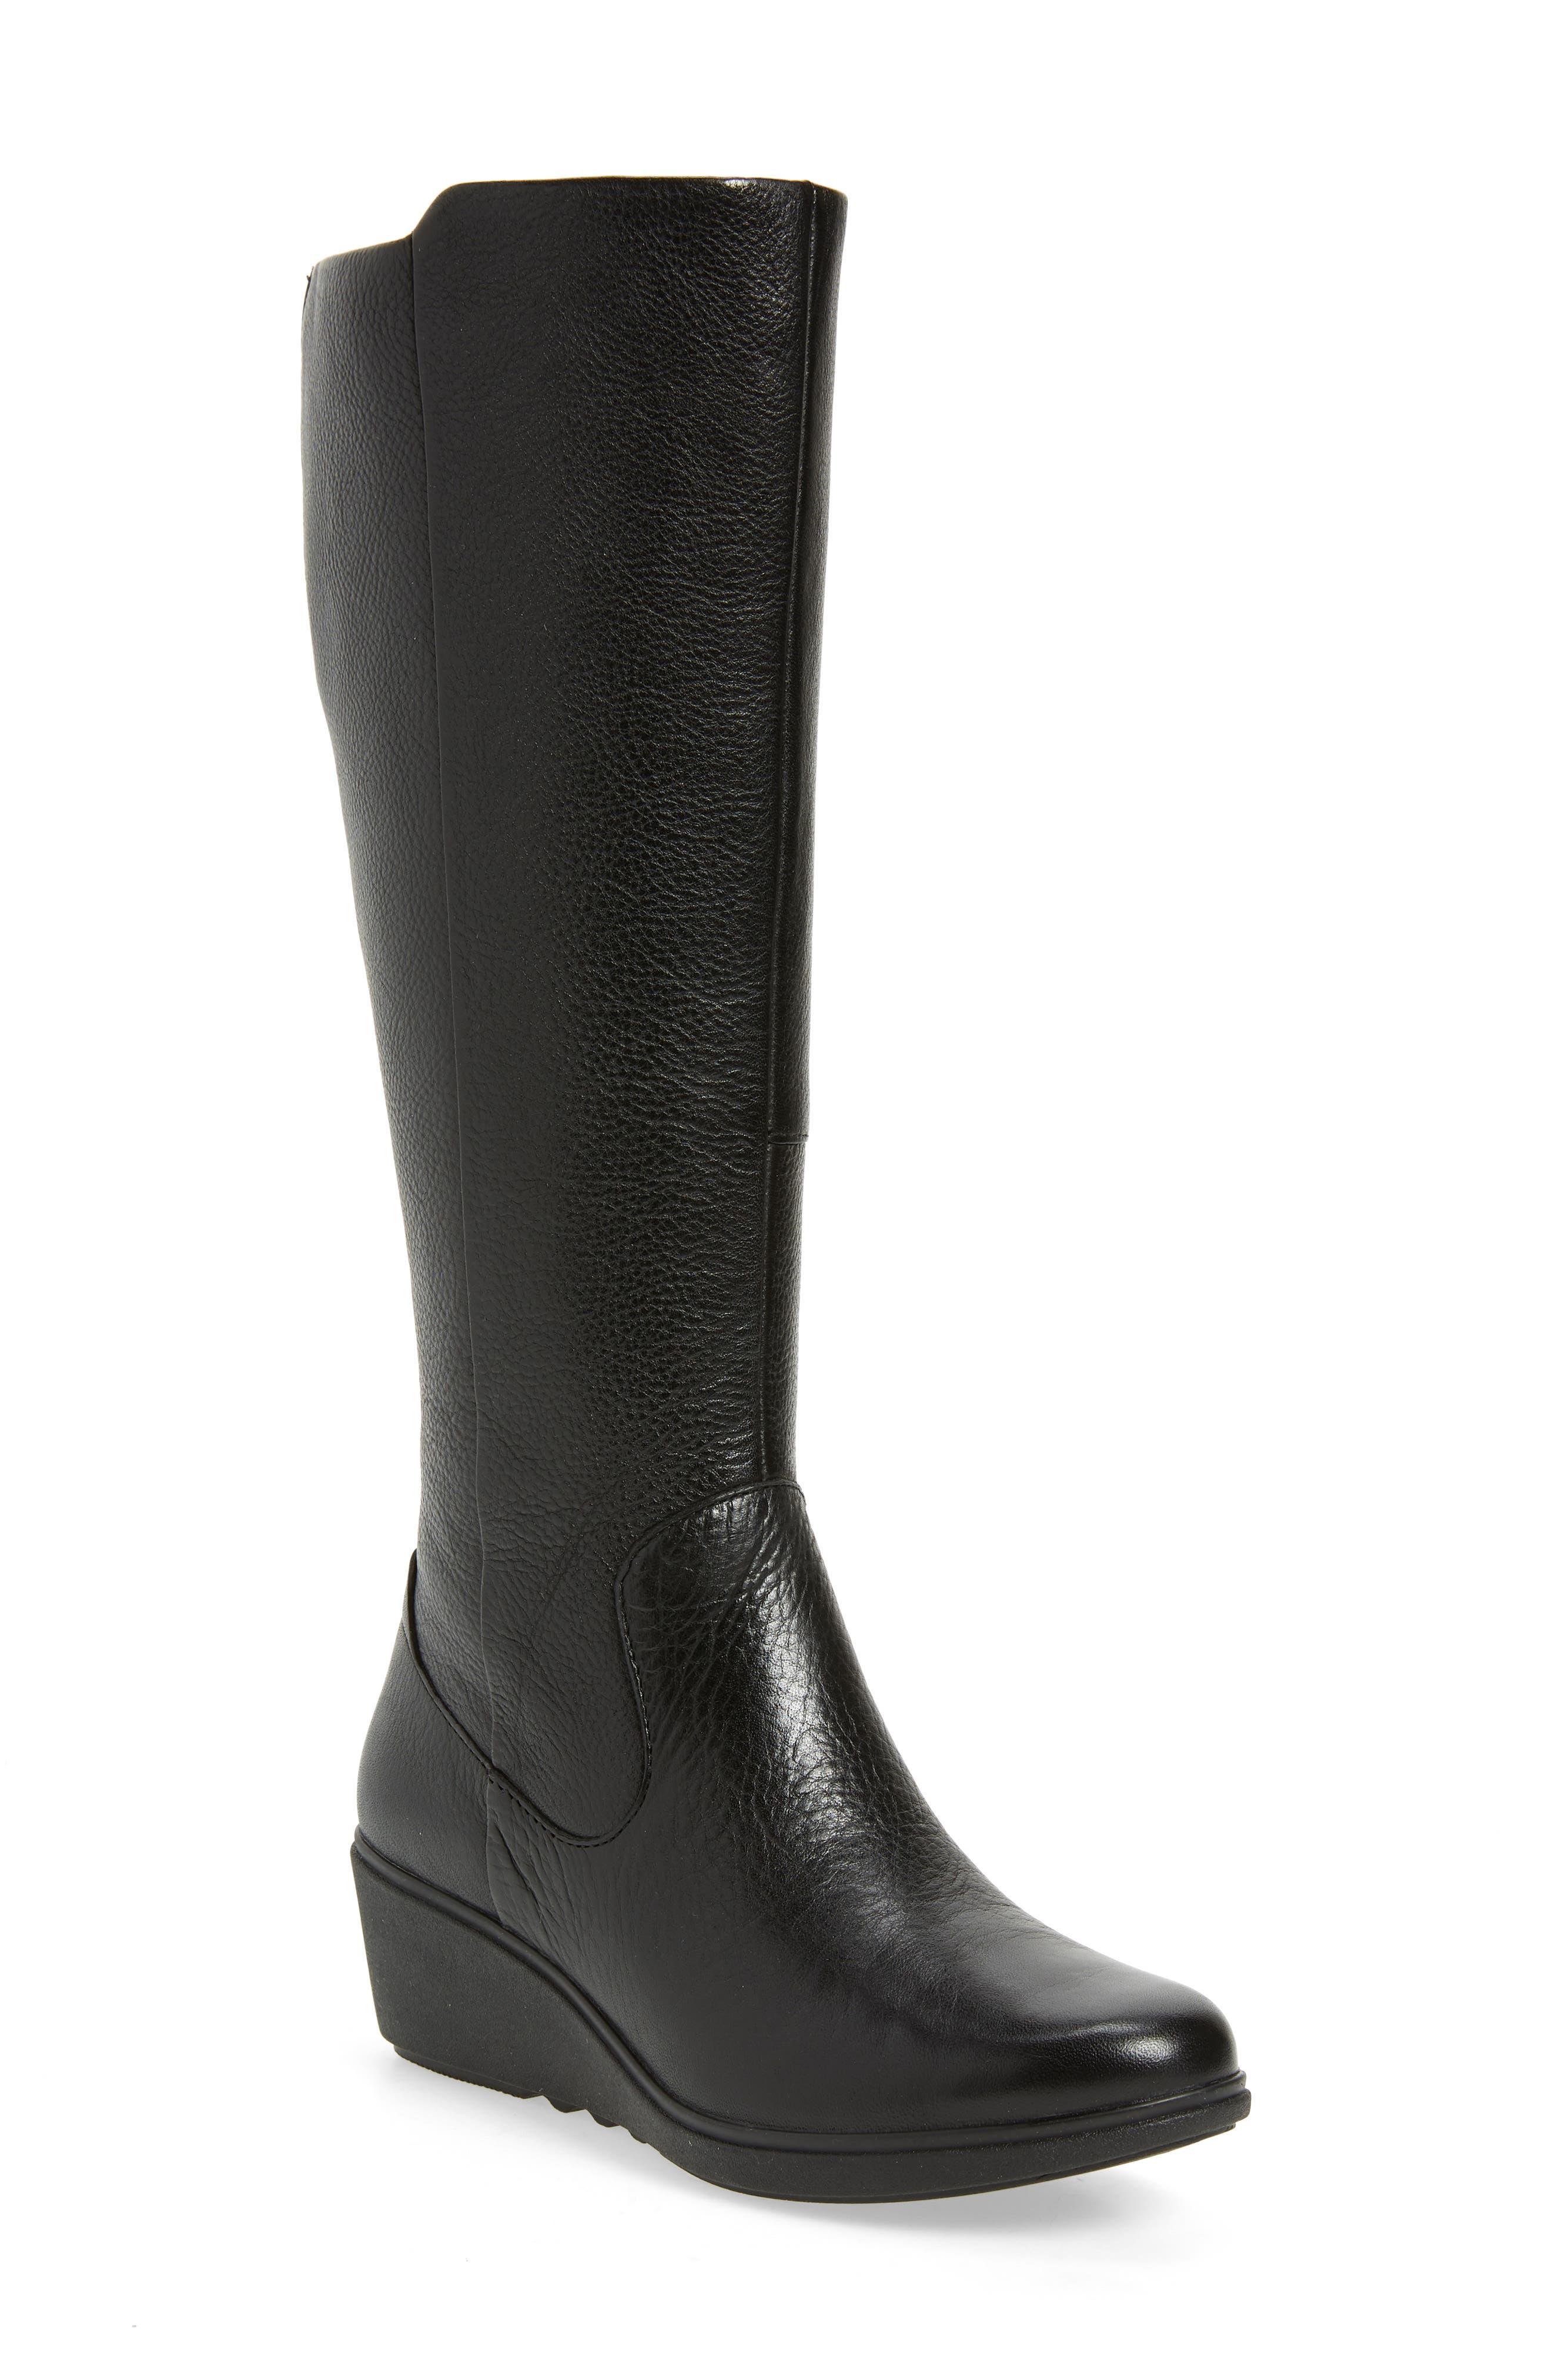 CLARKS<SUP>®</SUP> Un Tallara Esa Wedge Boot, Main, color, BLACK LEATHER